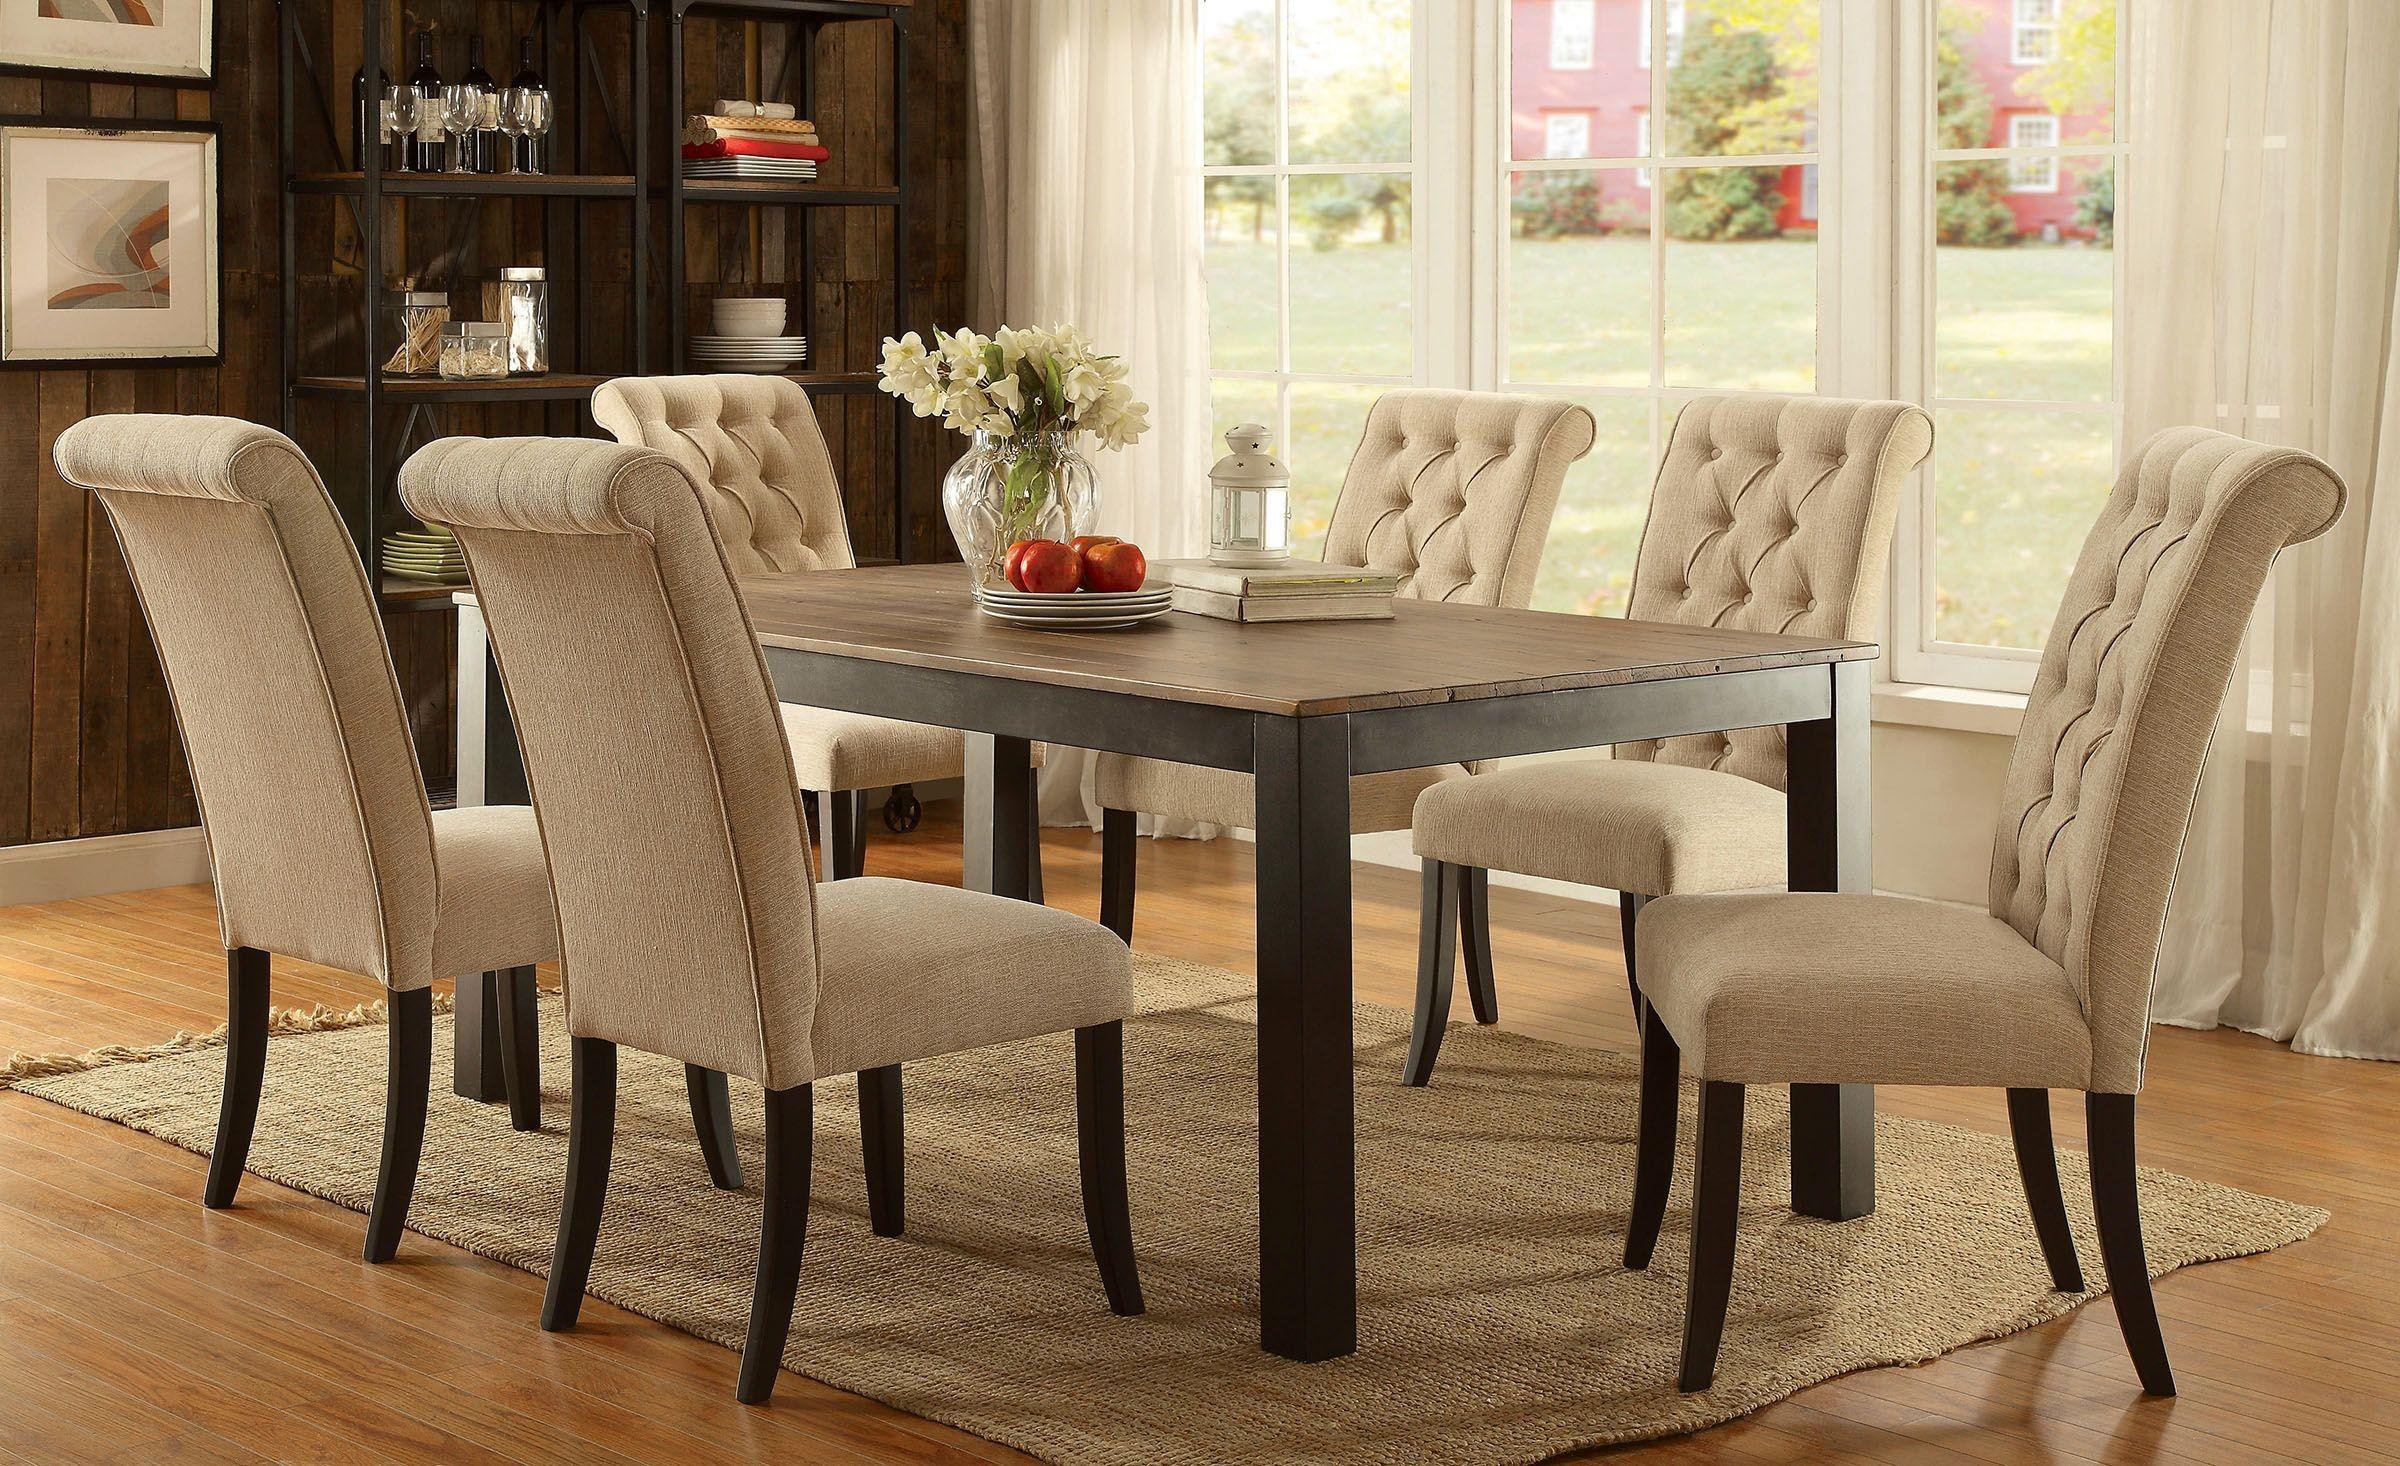 Marshall rustic oak rectangular dining room set cm t